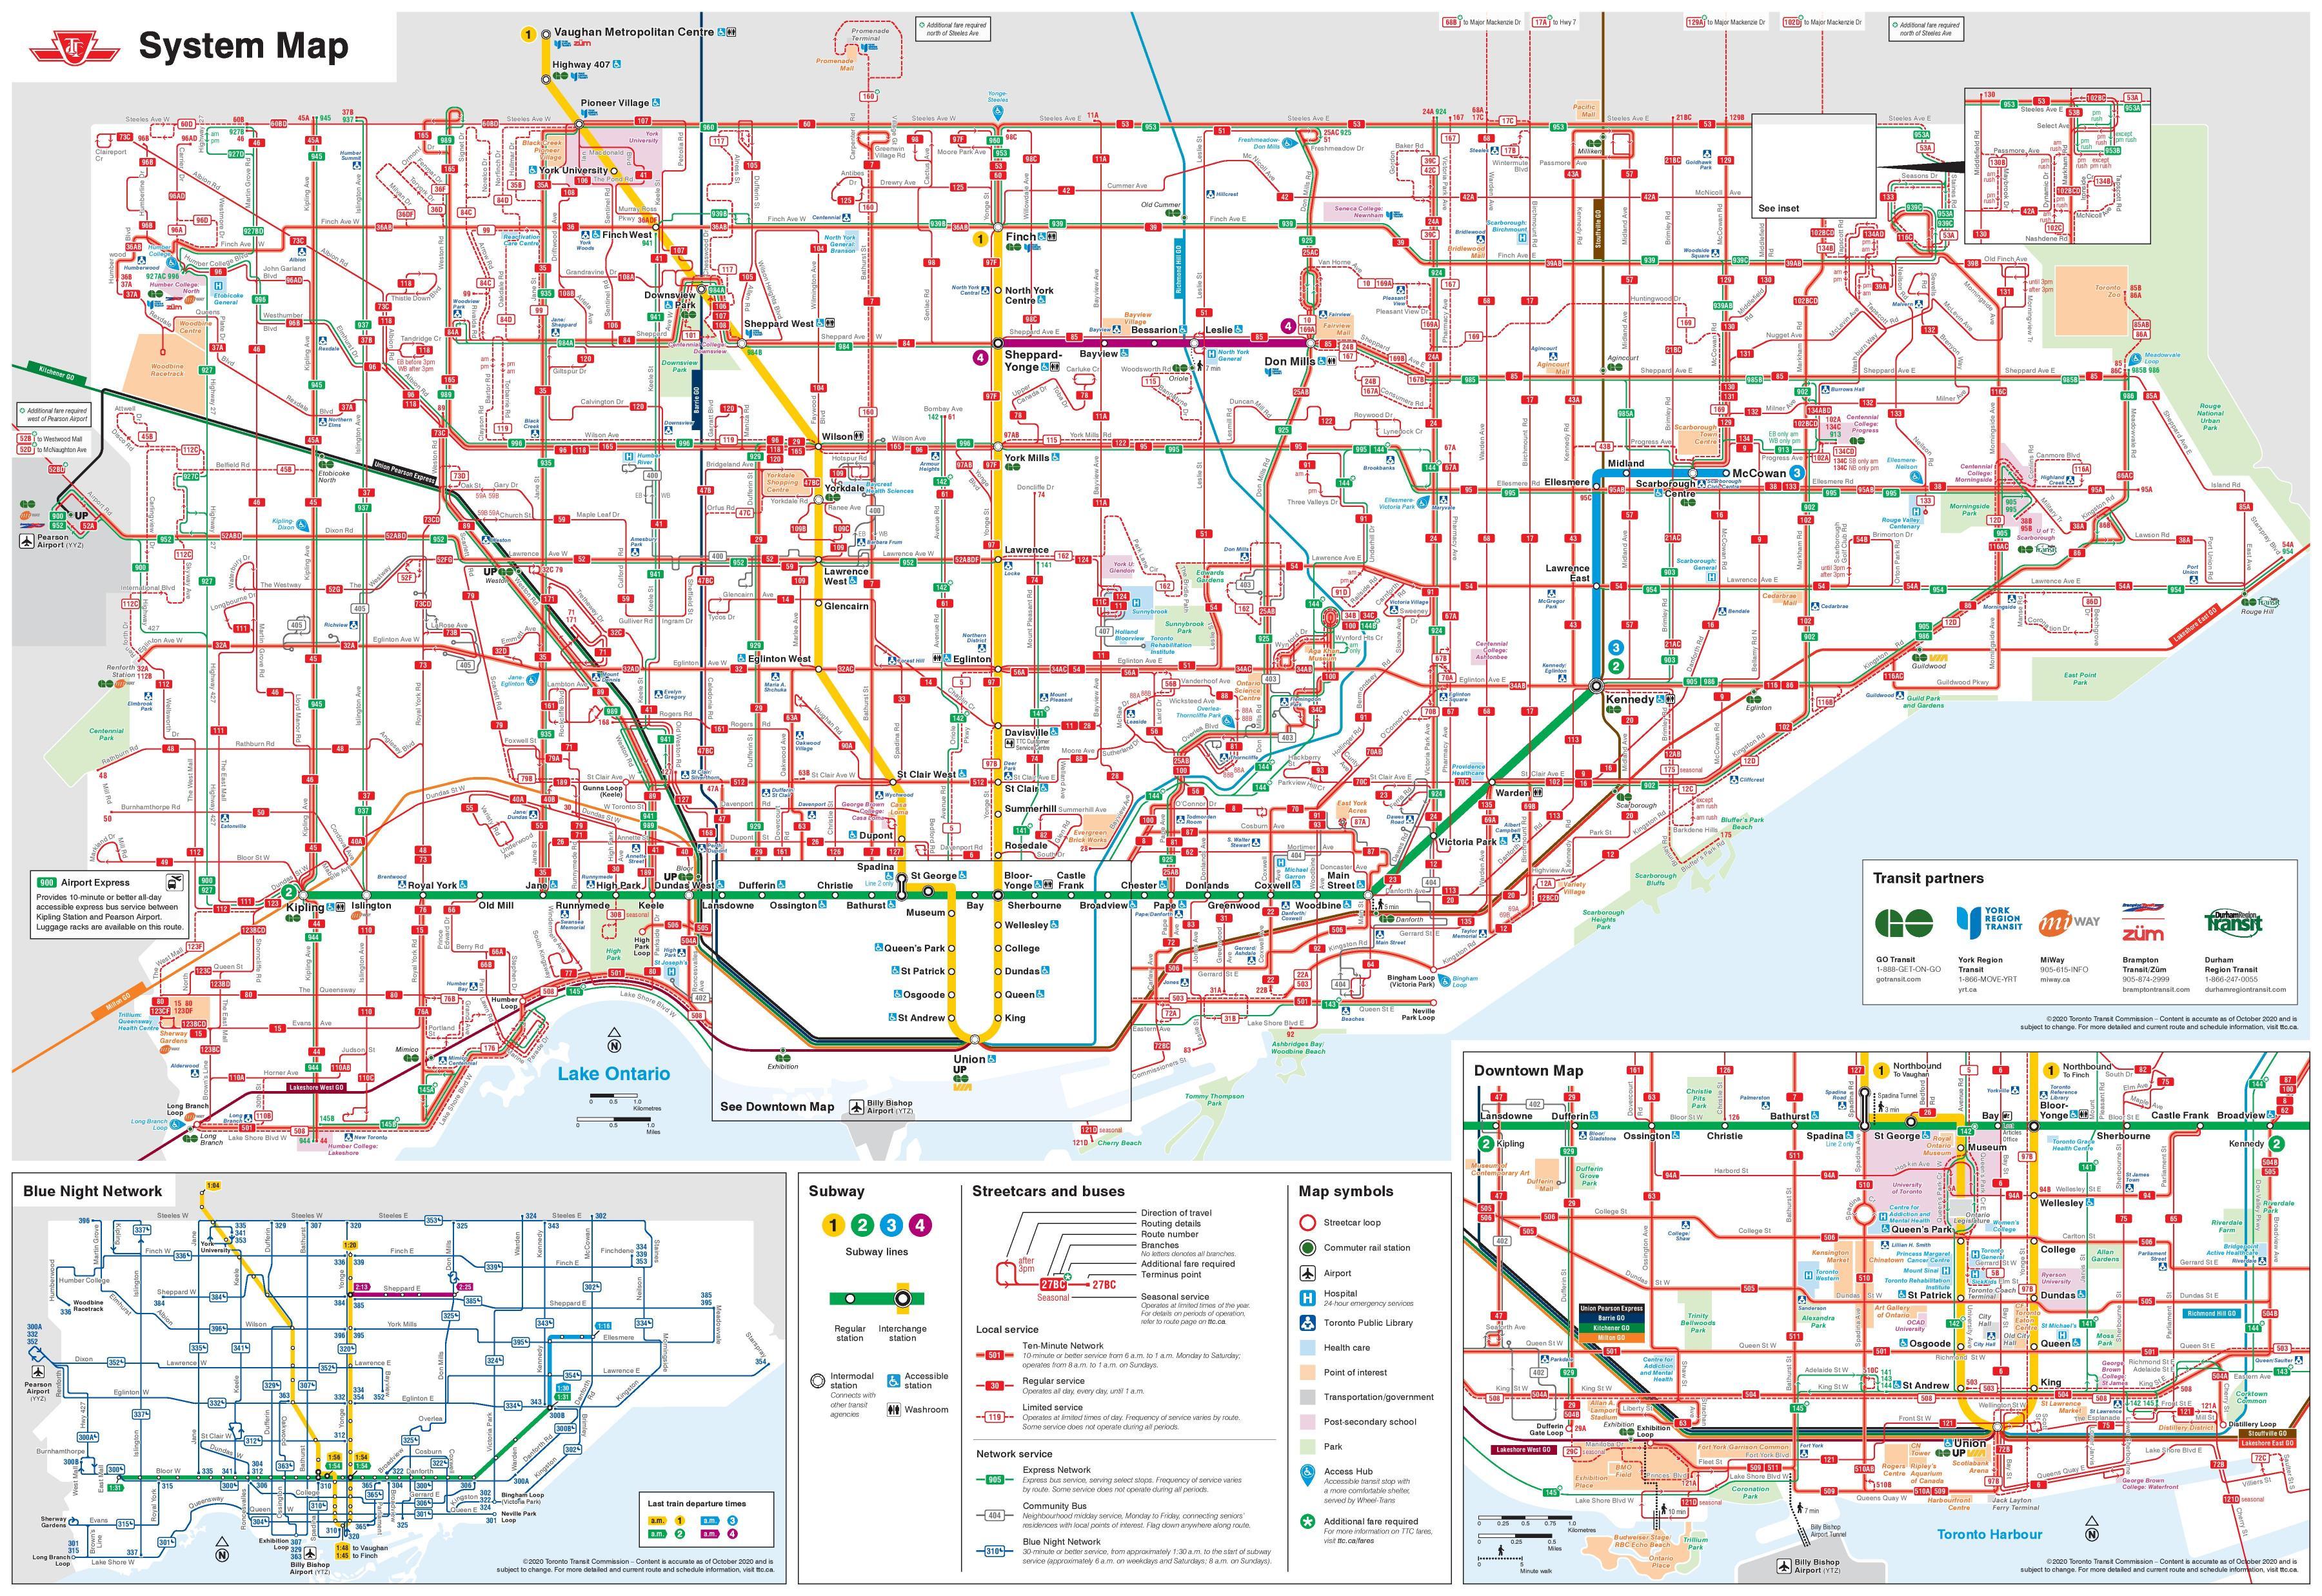 Ttc bus map - Ttc map Toronto bus (Canada)